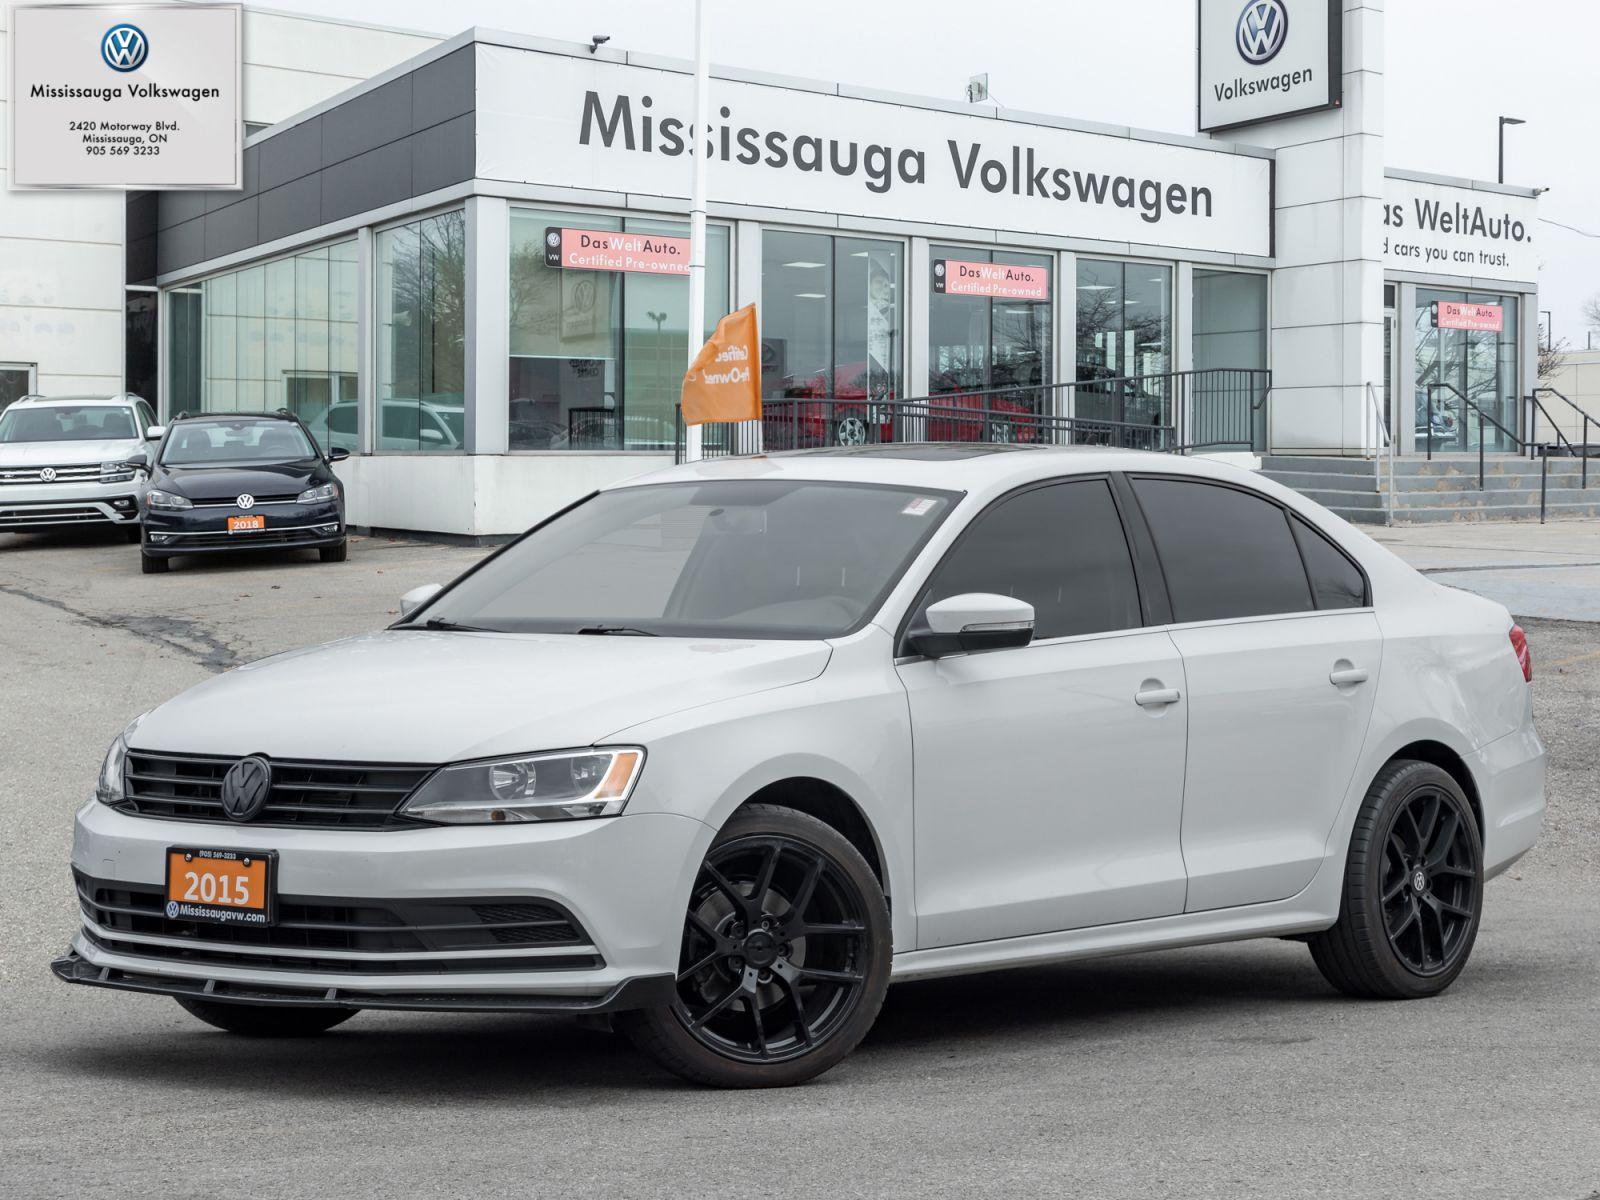 2015 Volkswagen Jetta Sedan Image